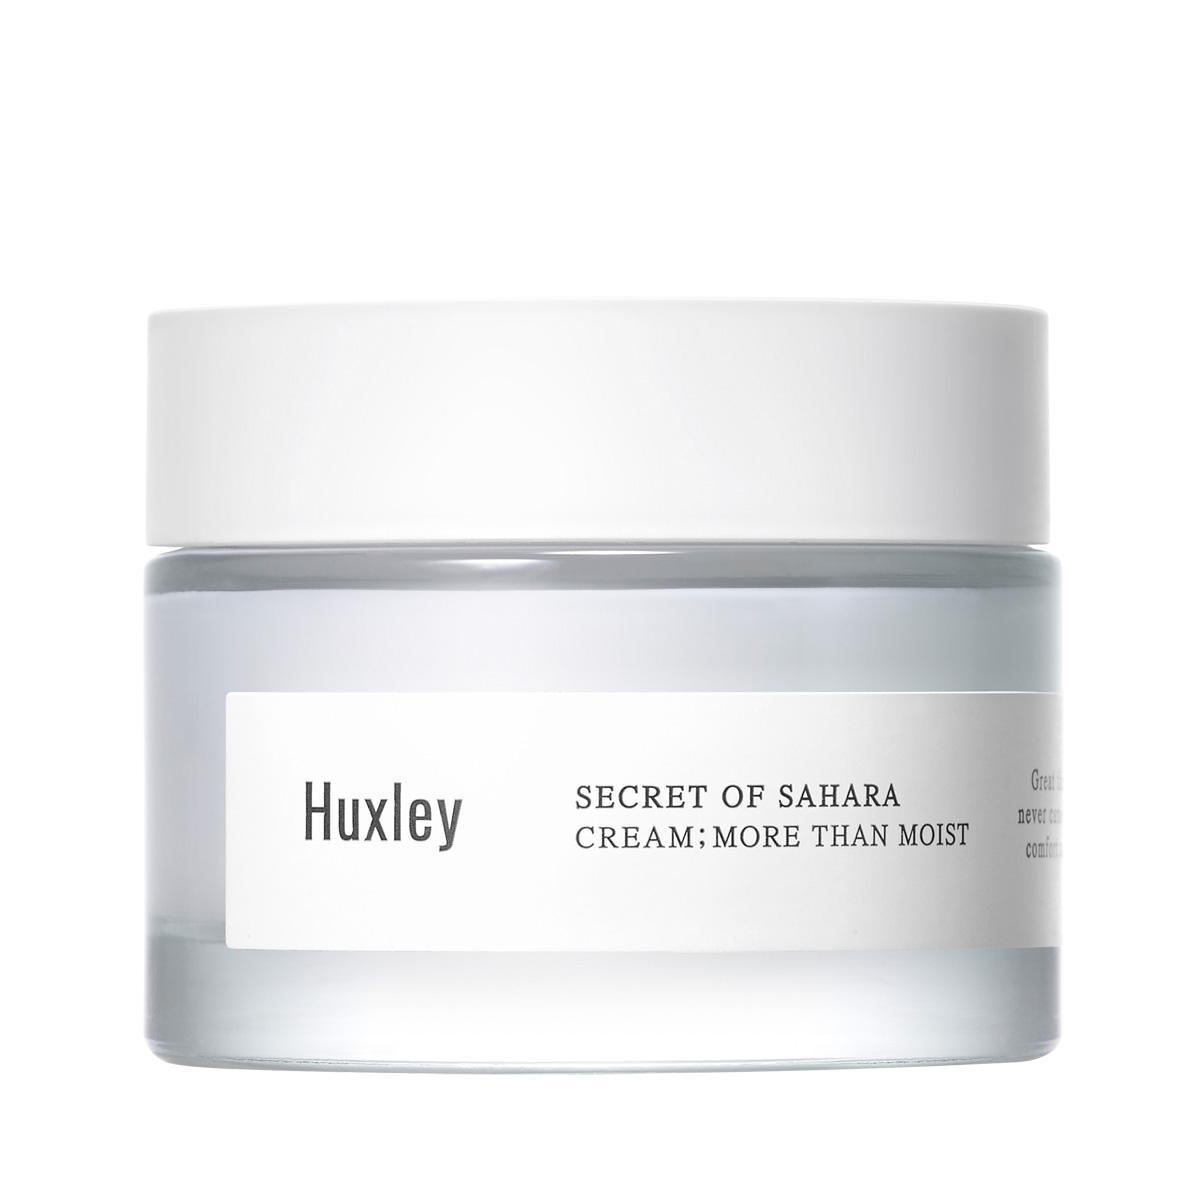 Bán Kem Dưỡng Ẩm Da Chống Lao Hoa Cao Cấp Danh Cho Da Nhạy Cảm Huxley Cream More Than Moist 50Ml Nguyên